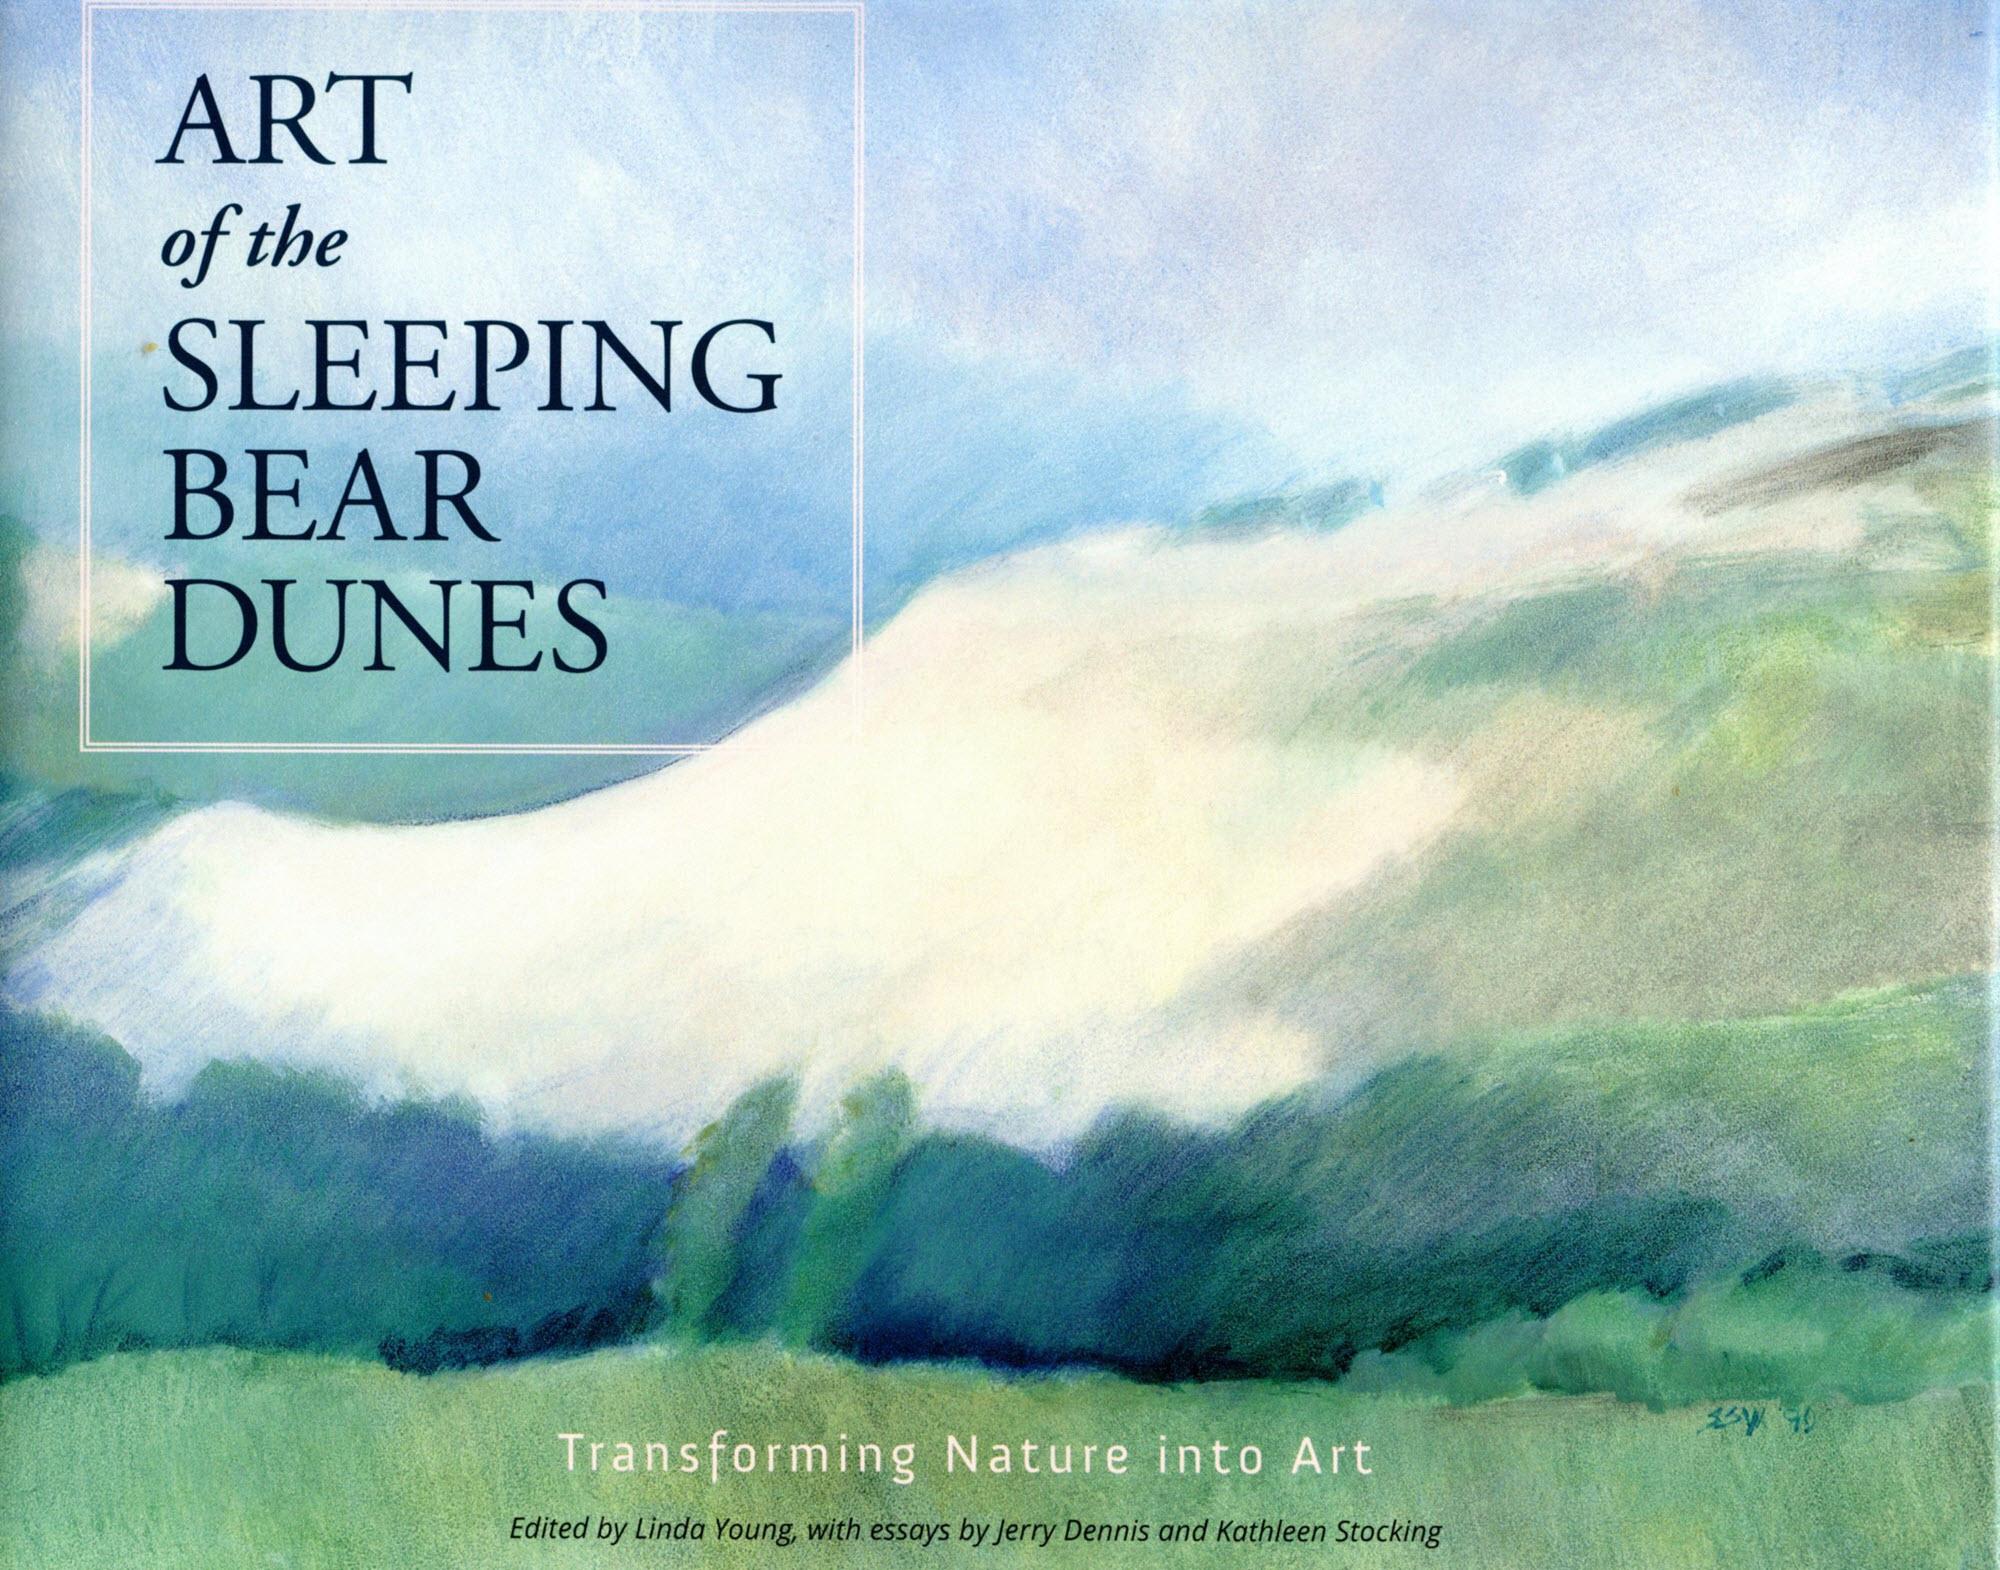 Art of Sleeping Bear Dune-2000.jpg